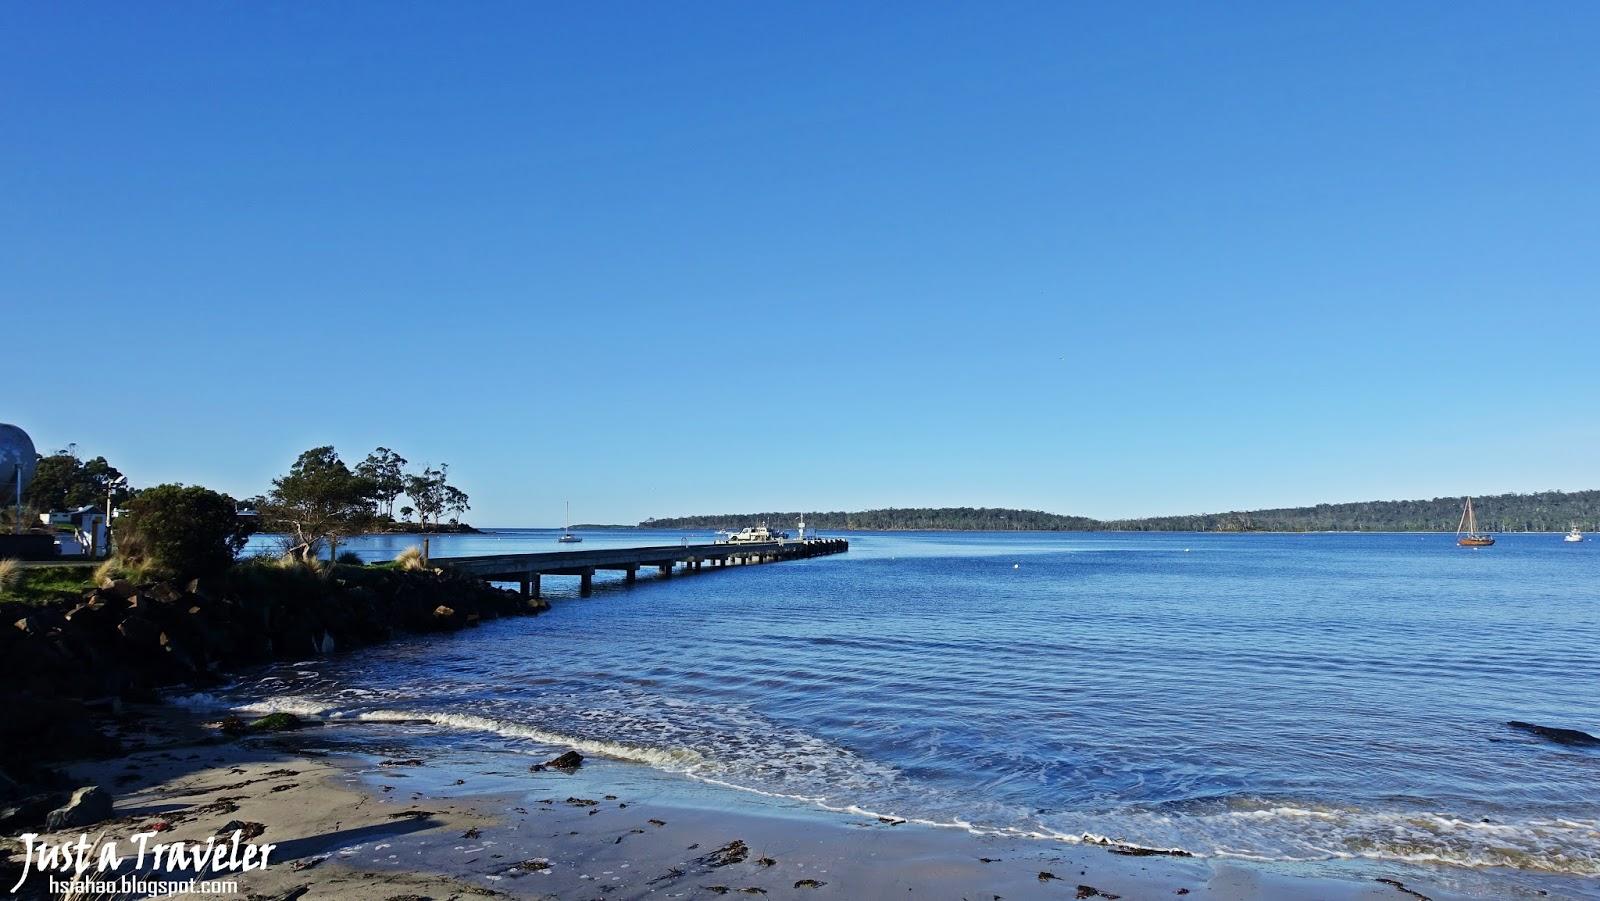 塔斯馬尼亞-景點-推薦-南港-South-Port-旅遊-自由行-澳洲-Tasmania-Tourist-Attraction-Travel-Australia